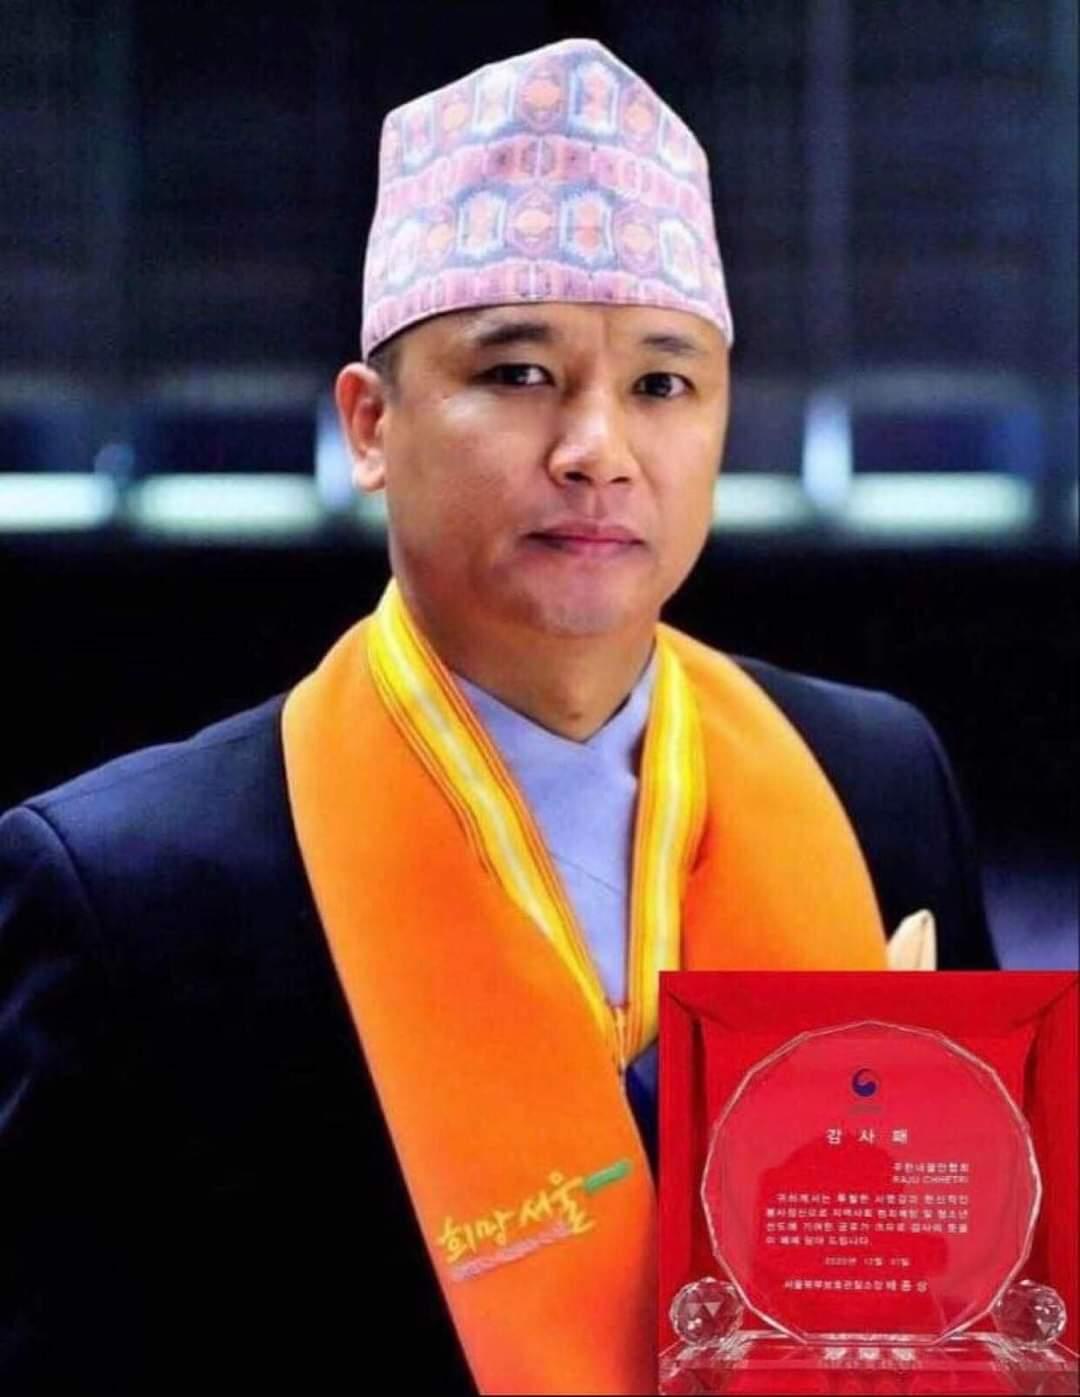 चर्चित खेलाडी तथा व्यावसायि नेपाली राजु क्षेत्री काेरियाकाे न्याय मन्त्रालय बाट सम्मानित